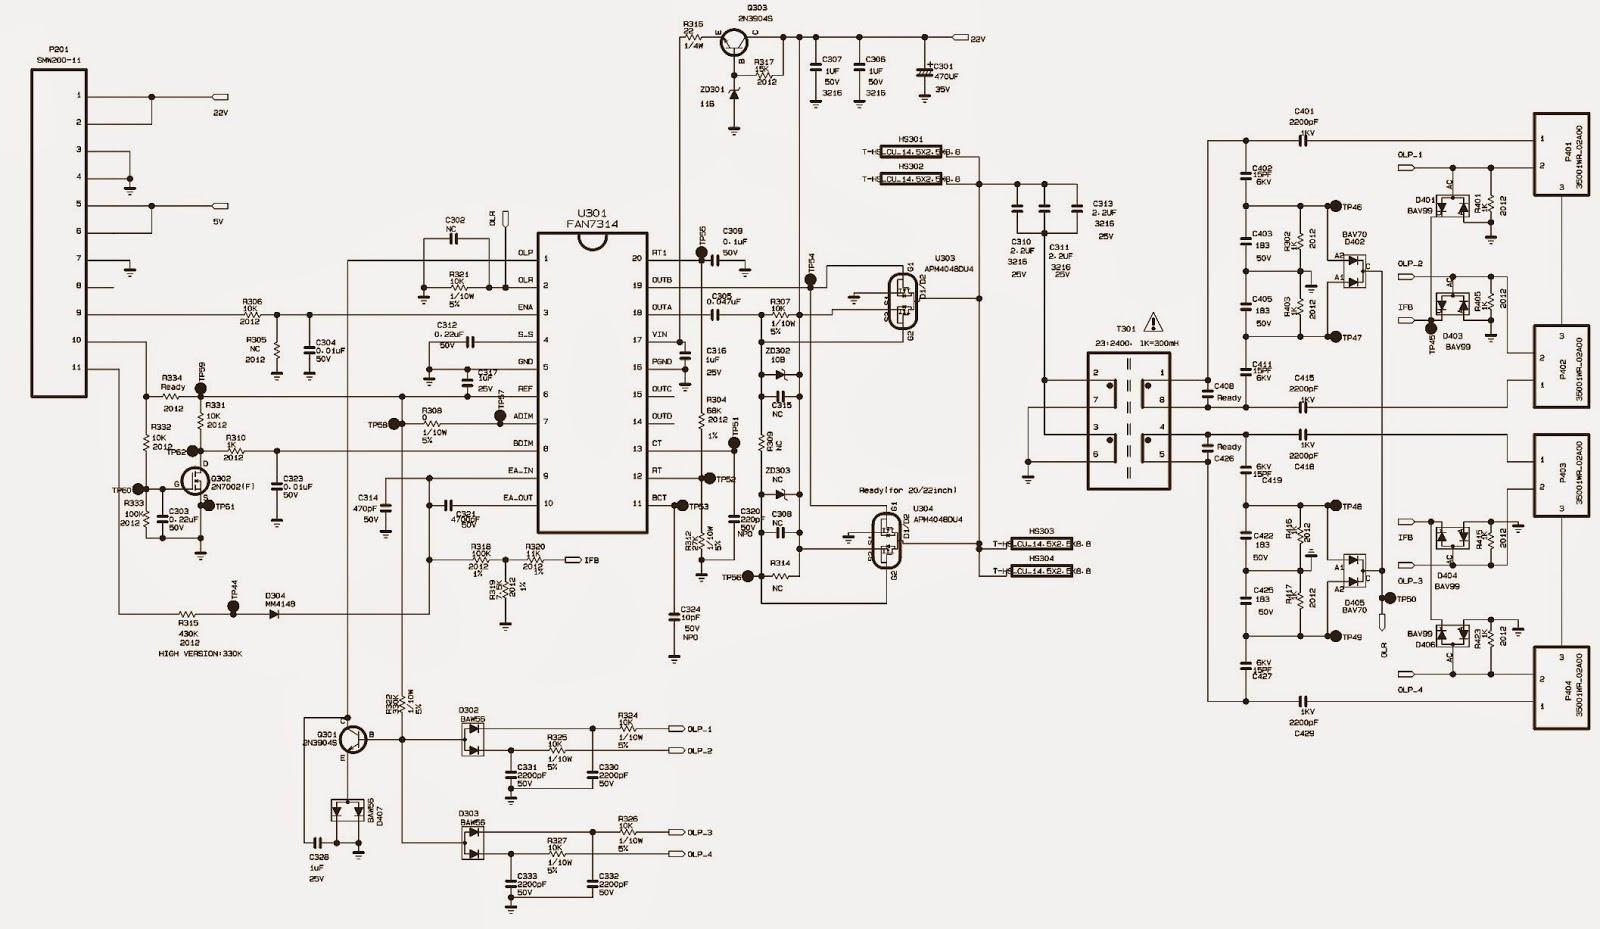 hight resolution of lg fridge wiring diagrams gallery lg flatron w1942s lcd monitor u2013 aocl32w831 u2013 philco28t35dg